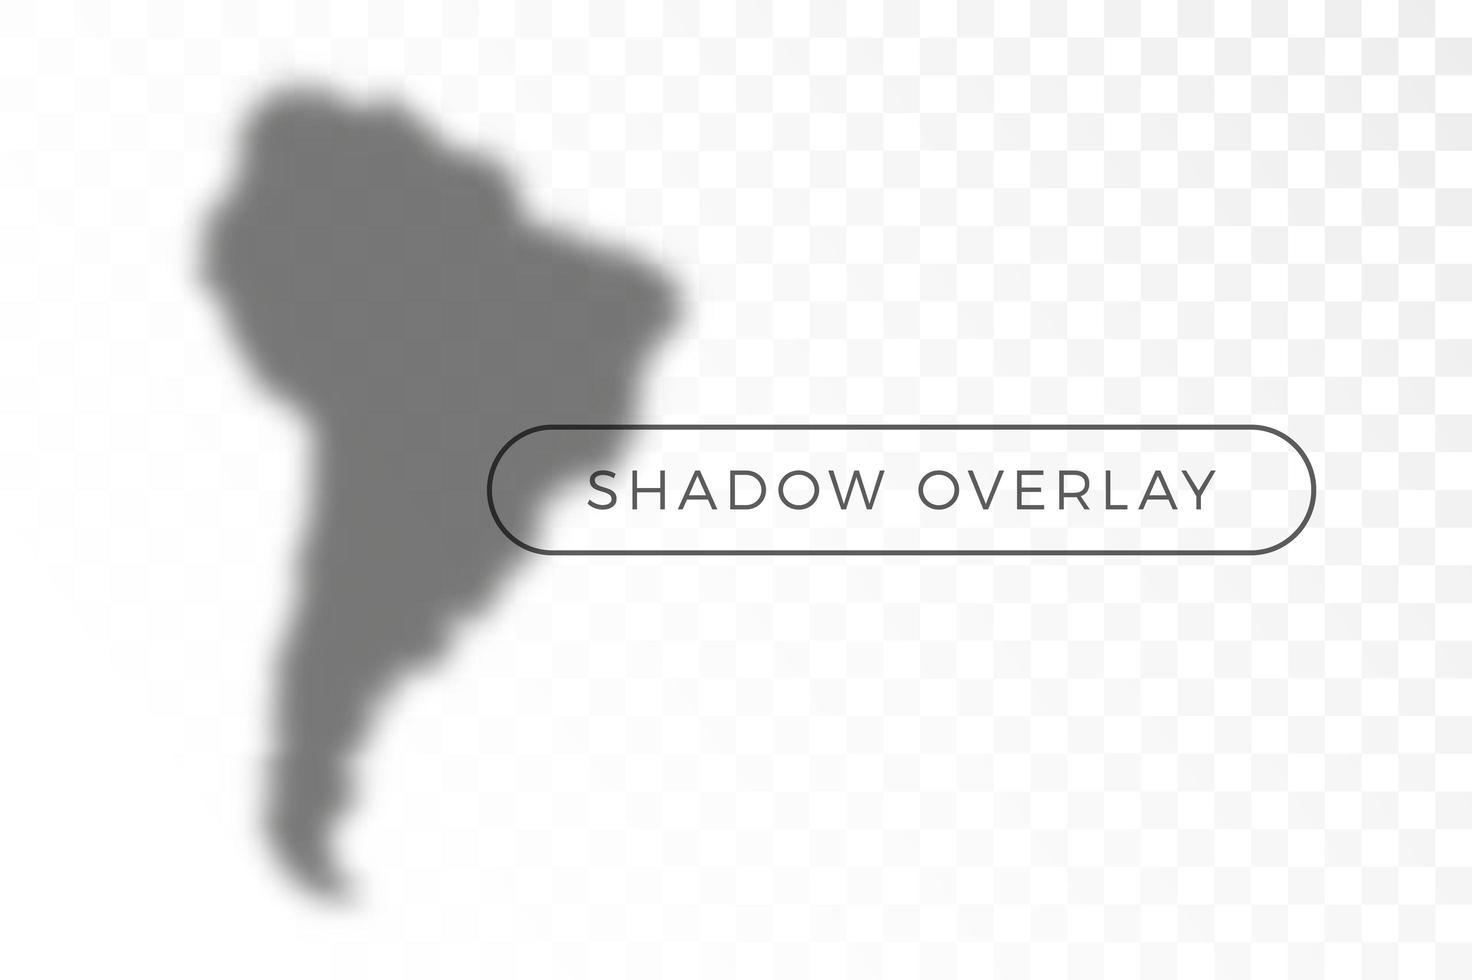 Südamerika Weltkarte Schatten vektor